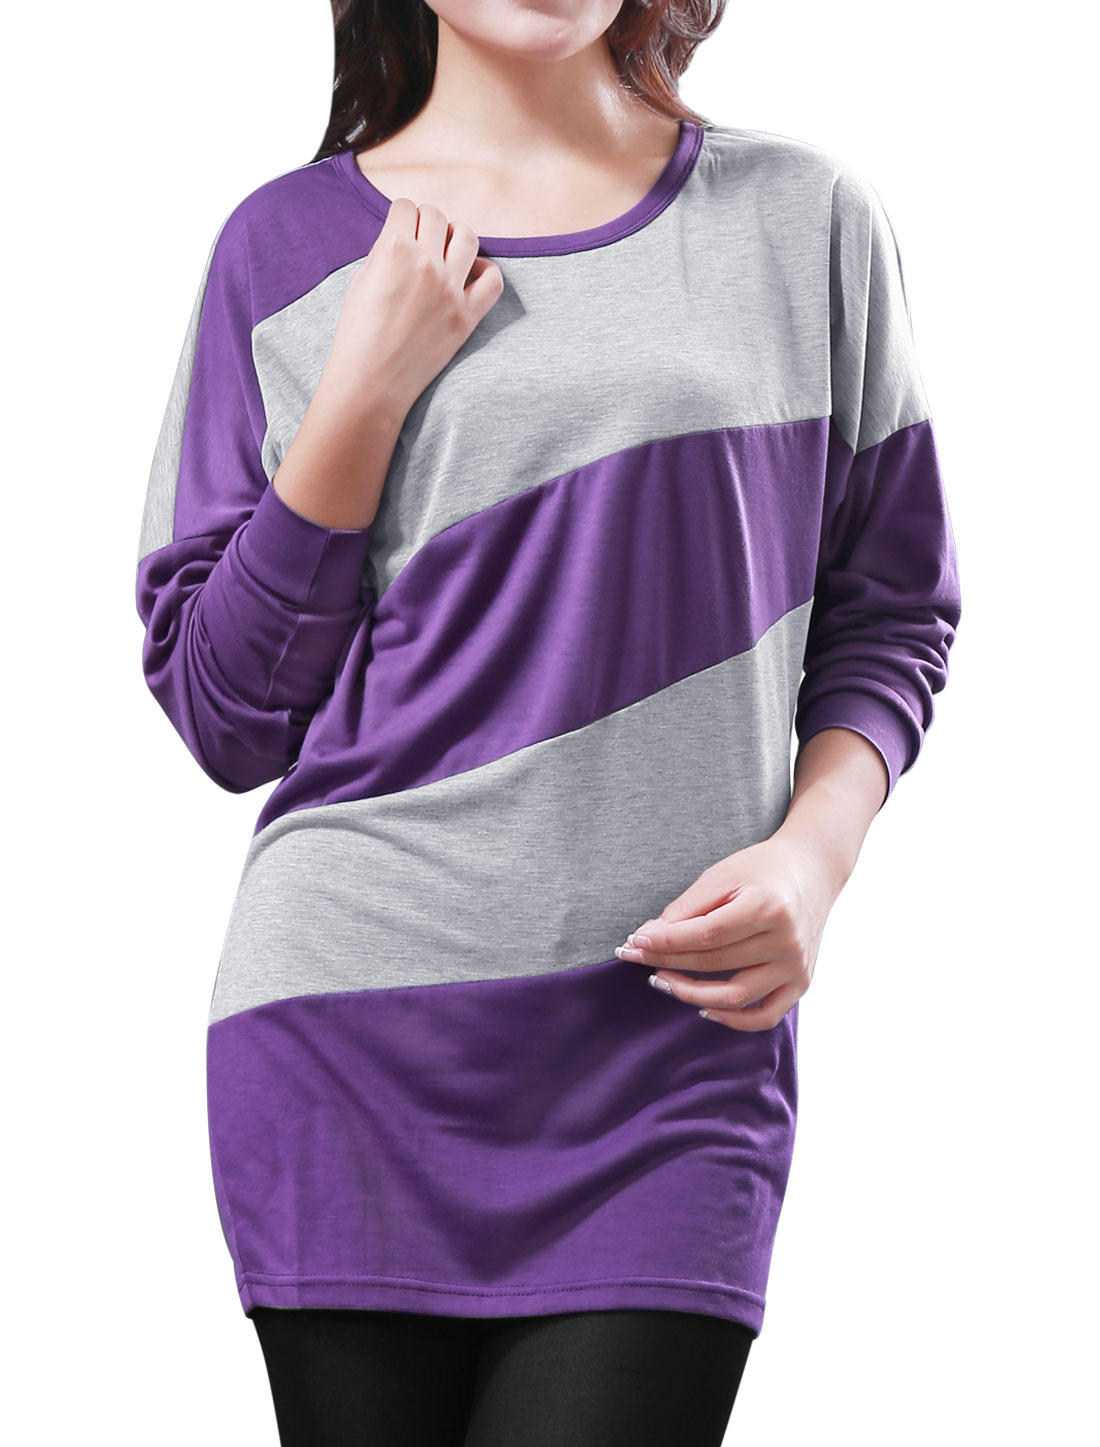 Women Colorblock Long Dolman Sleeved Shirt Purple Gray 1X